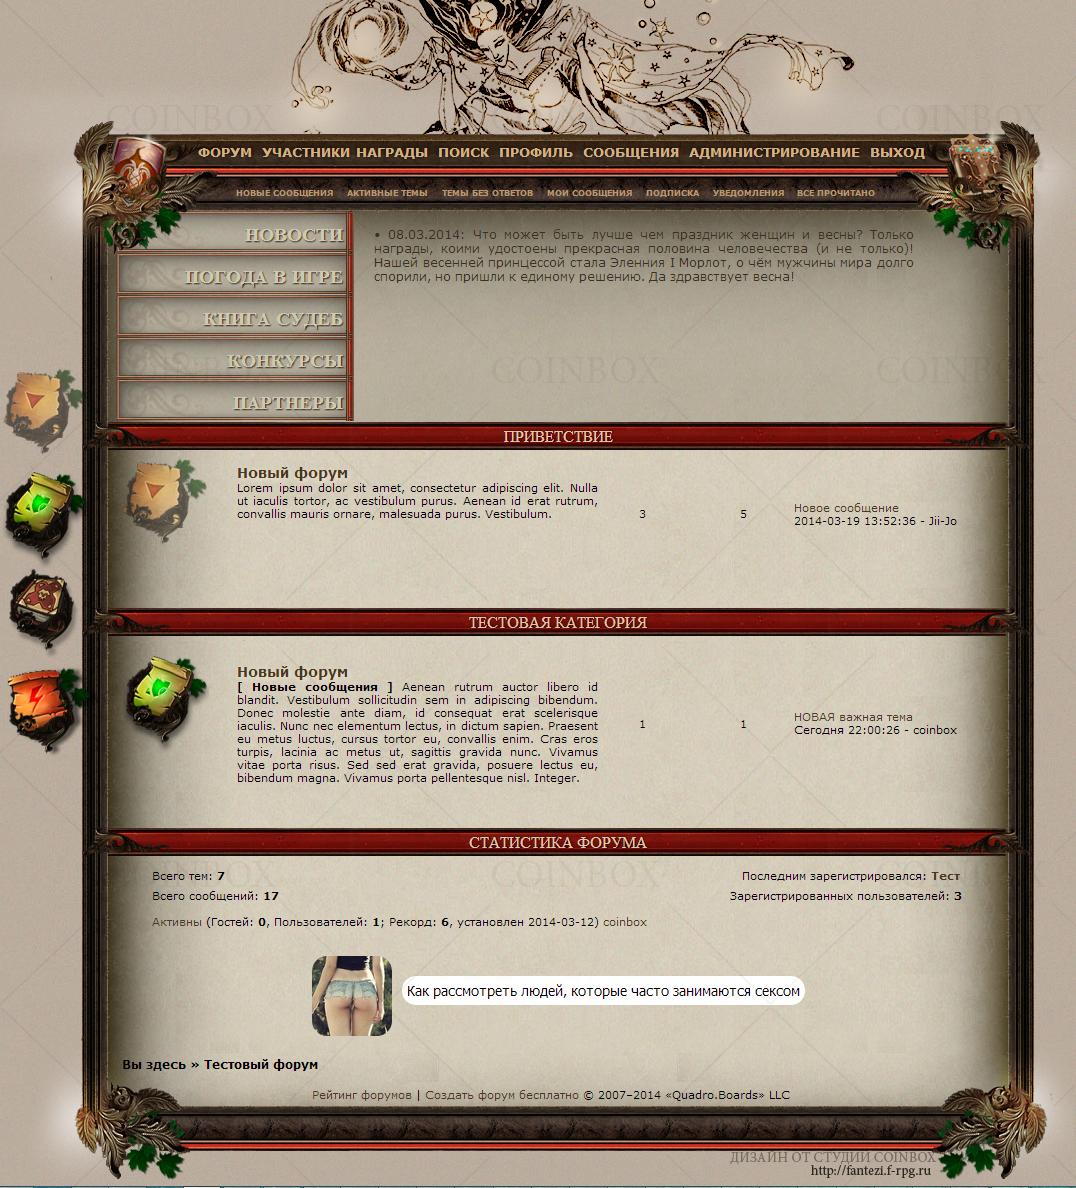 http://orig13.deviantart.net/881f/f/2014/082/3/0/anayren_by_coinboxlab-d7bcc36.jpg